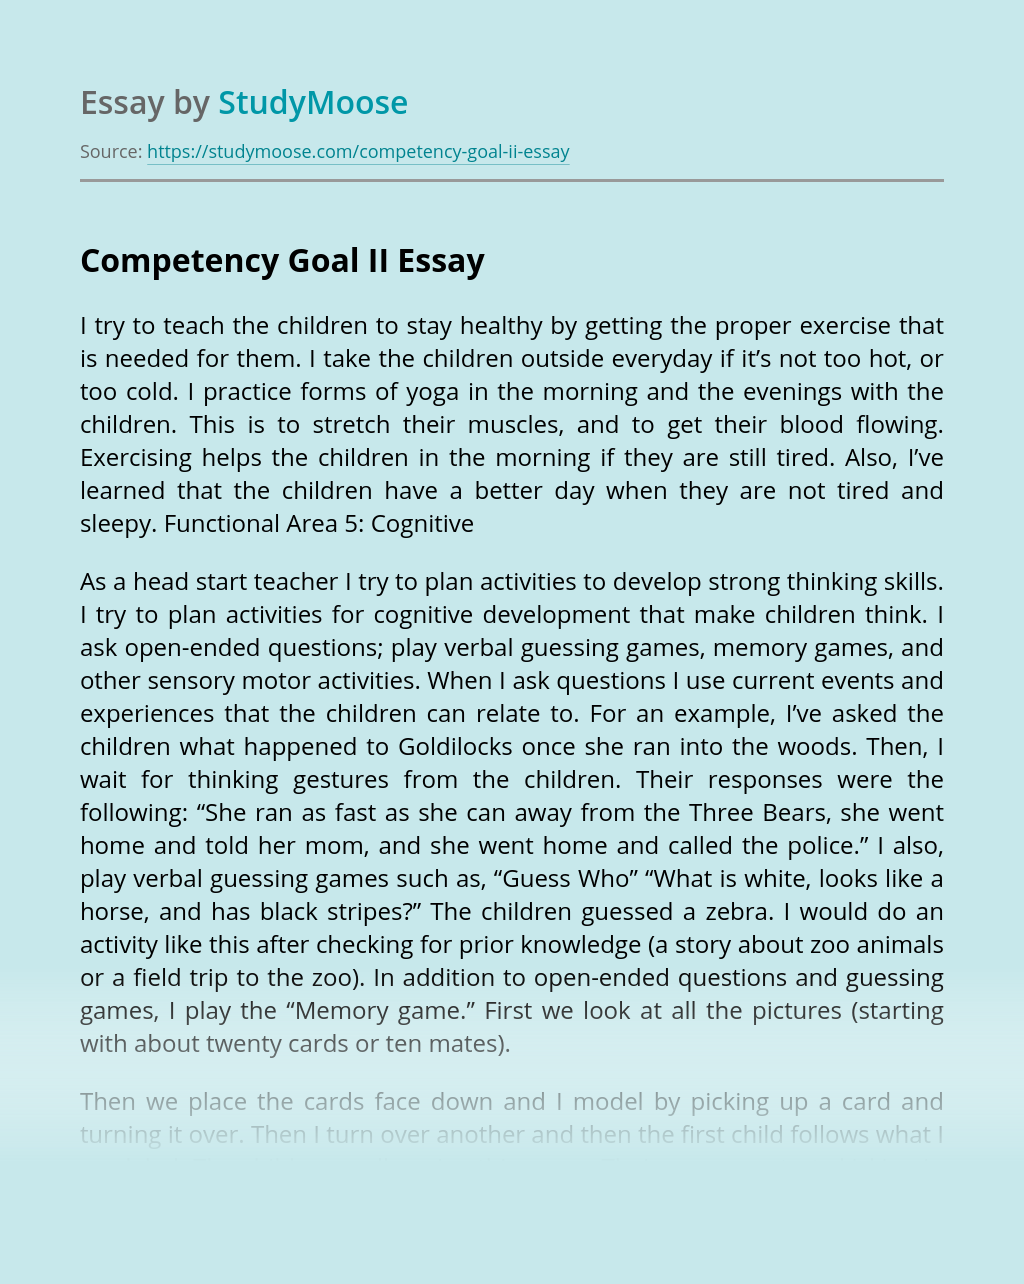 Competency Goal II